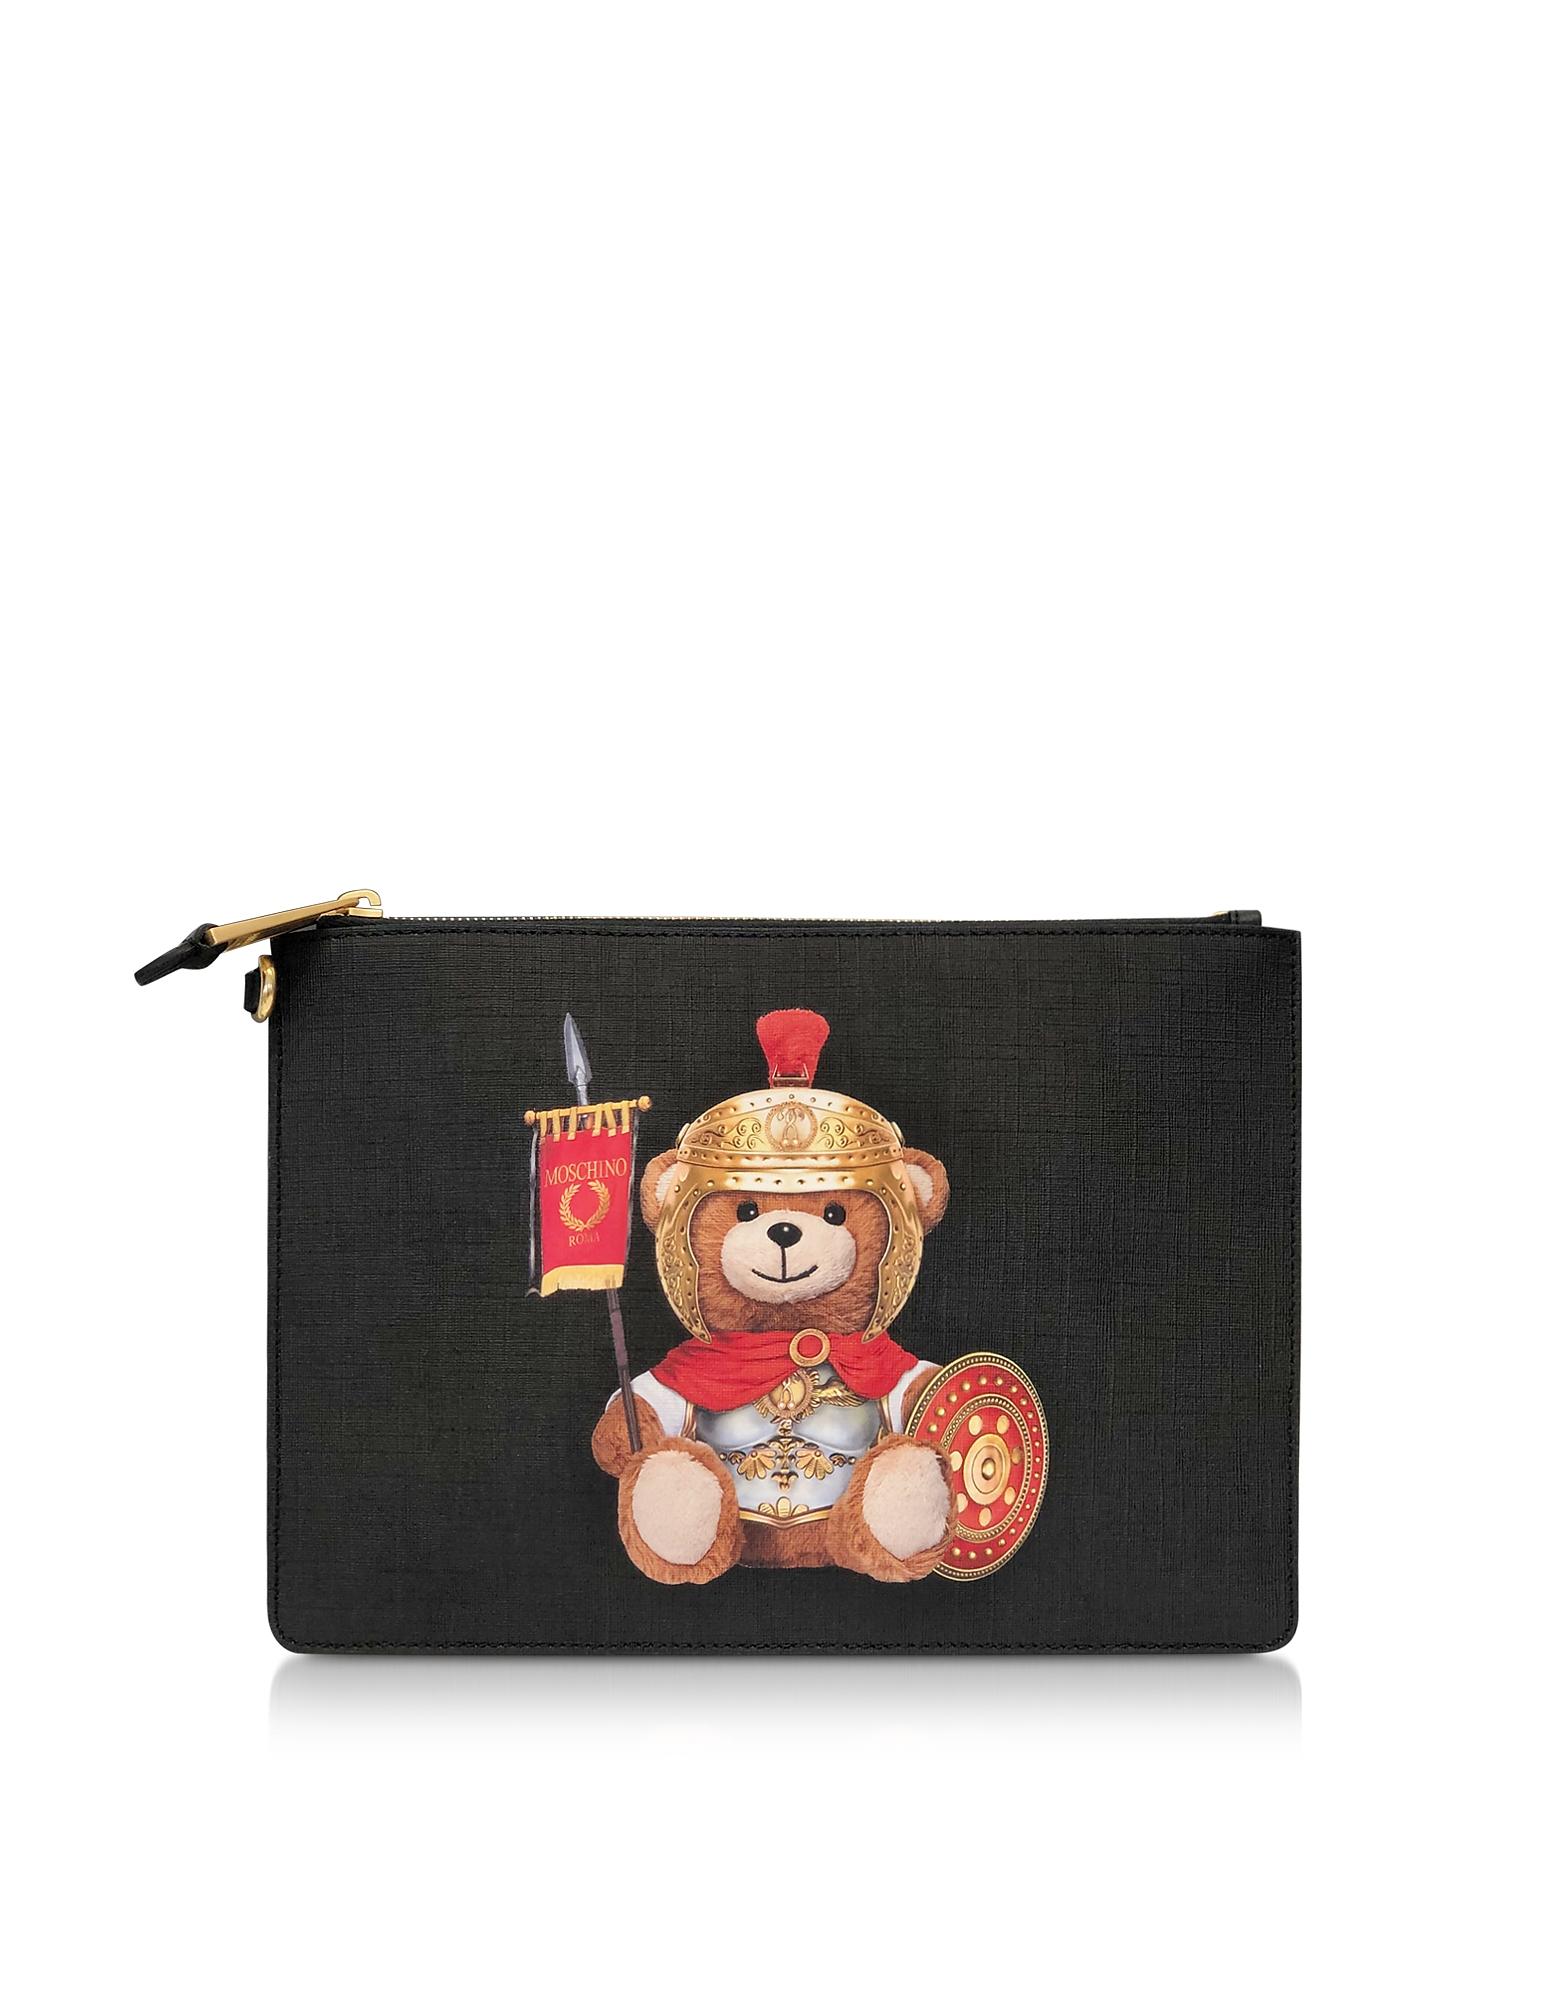 UPC 820771815005 product image for Moschino Designer Handbags, Roman Teddy Bear Flat Clutch w/Wristlet   upcitemdb.com